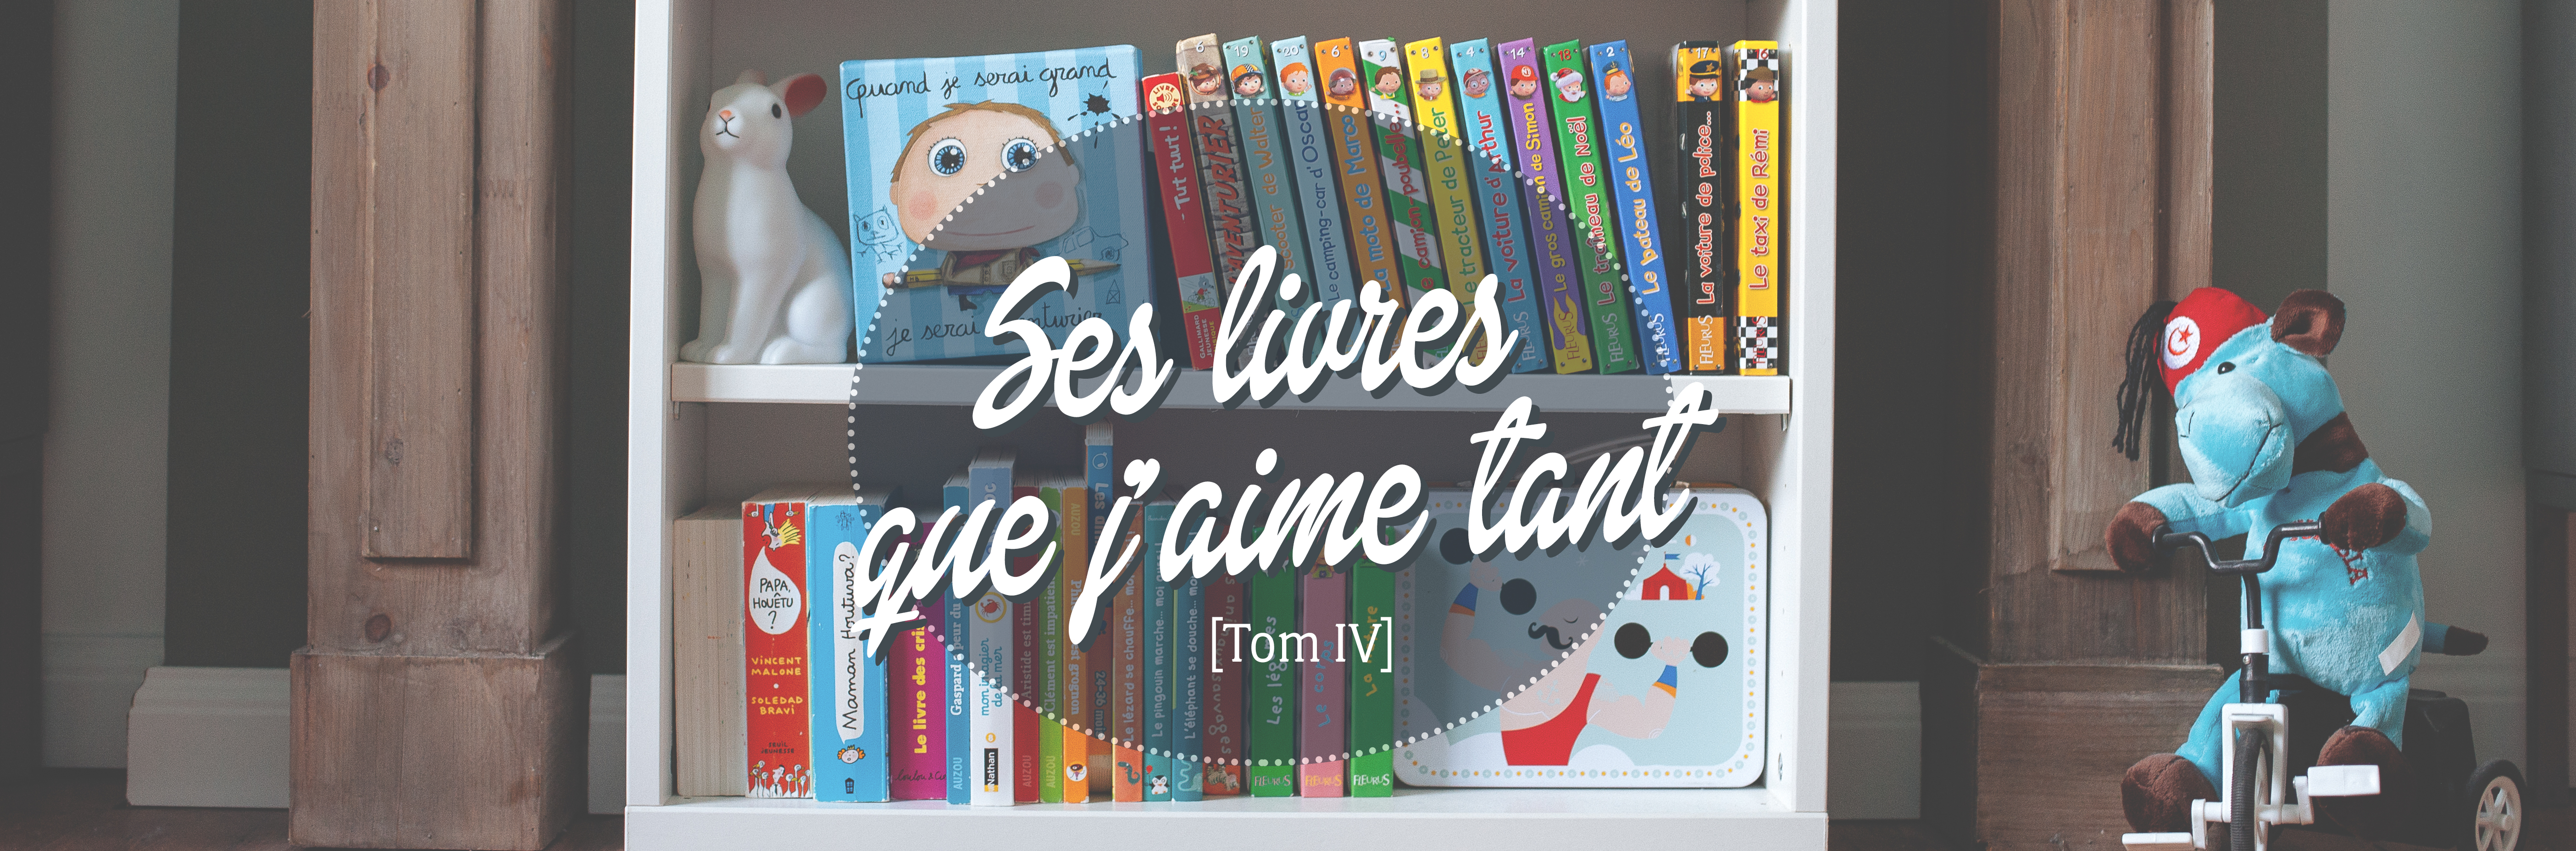 Ses livres que j'aime tant (coups de coeur) [Tom(e) IV]